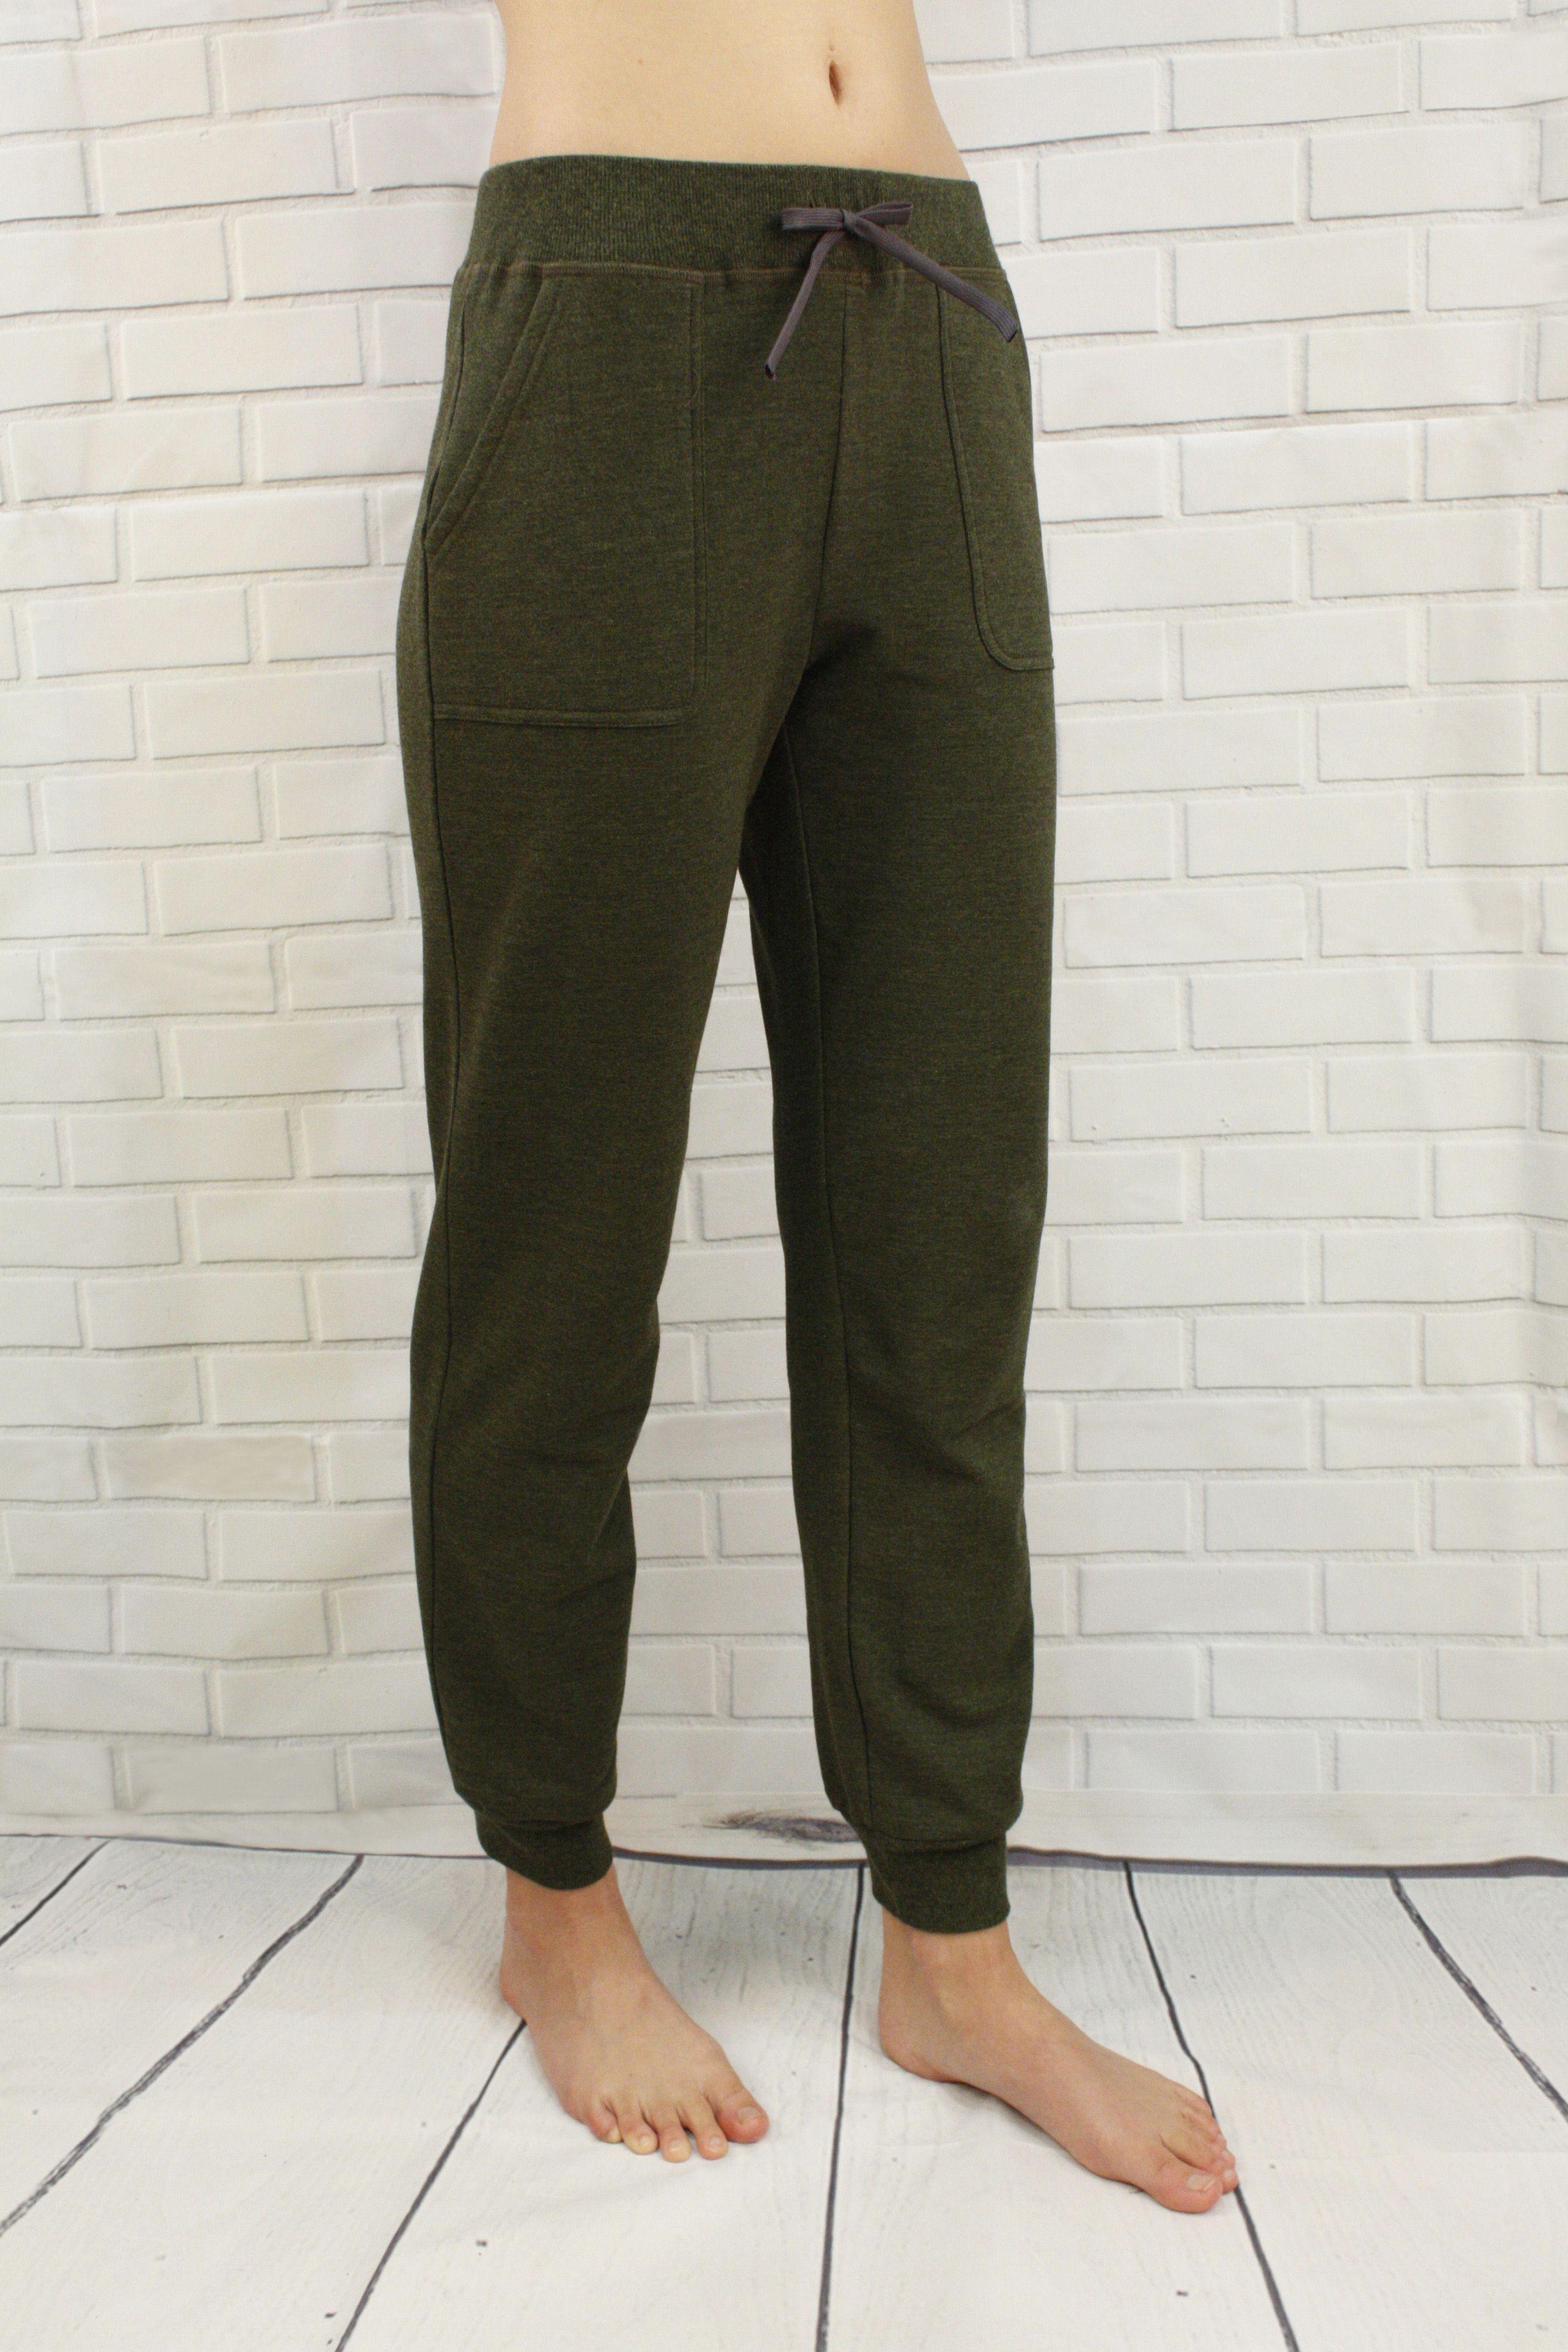 dcb4ca5d996a Aidan Bamboo Fleece Pants in Green - Warm fuzzy